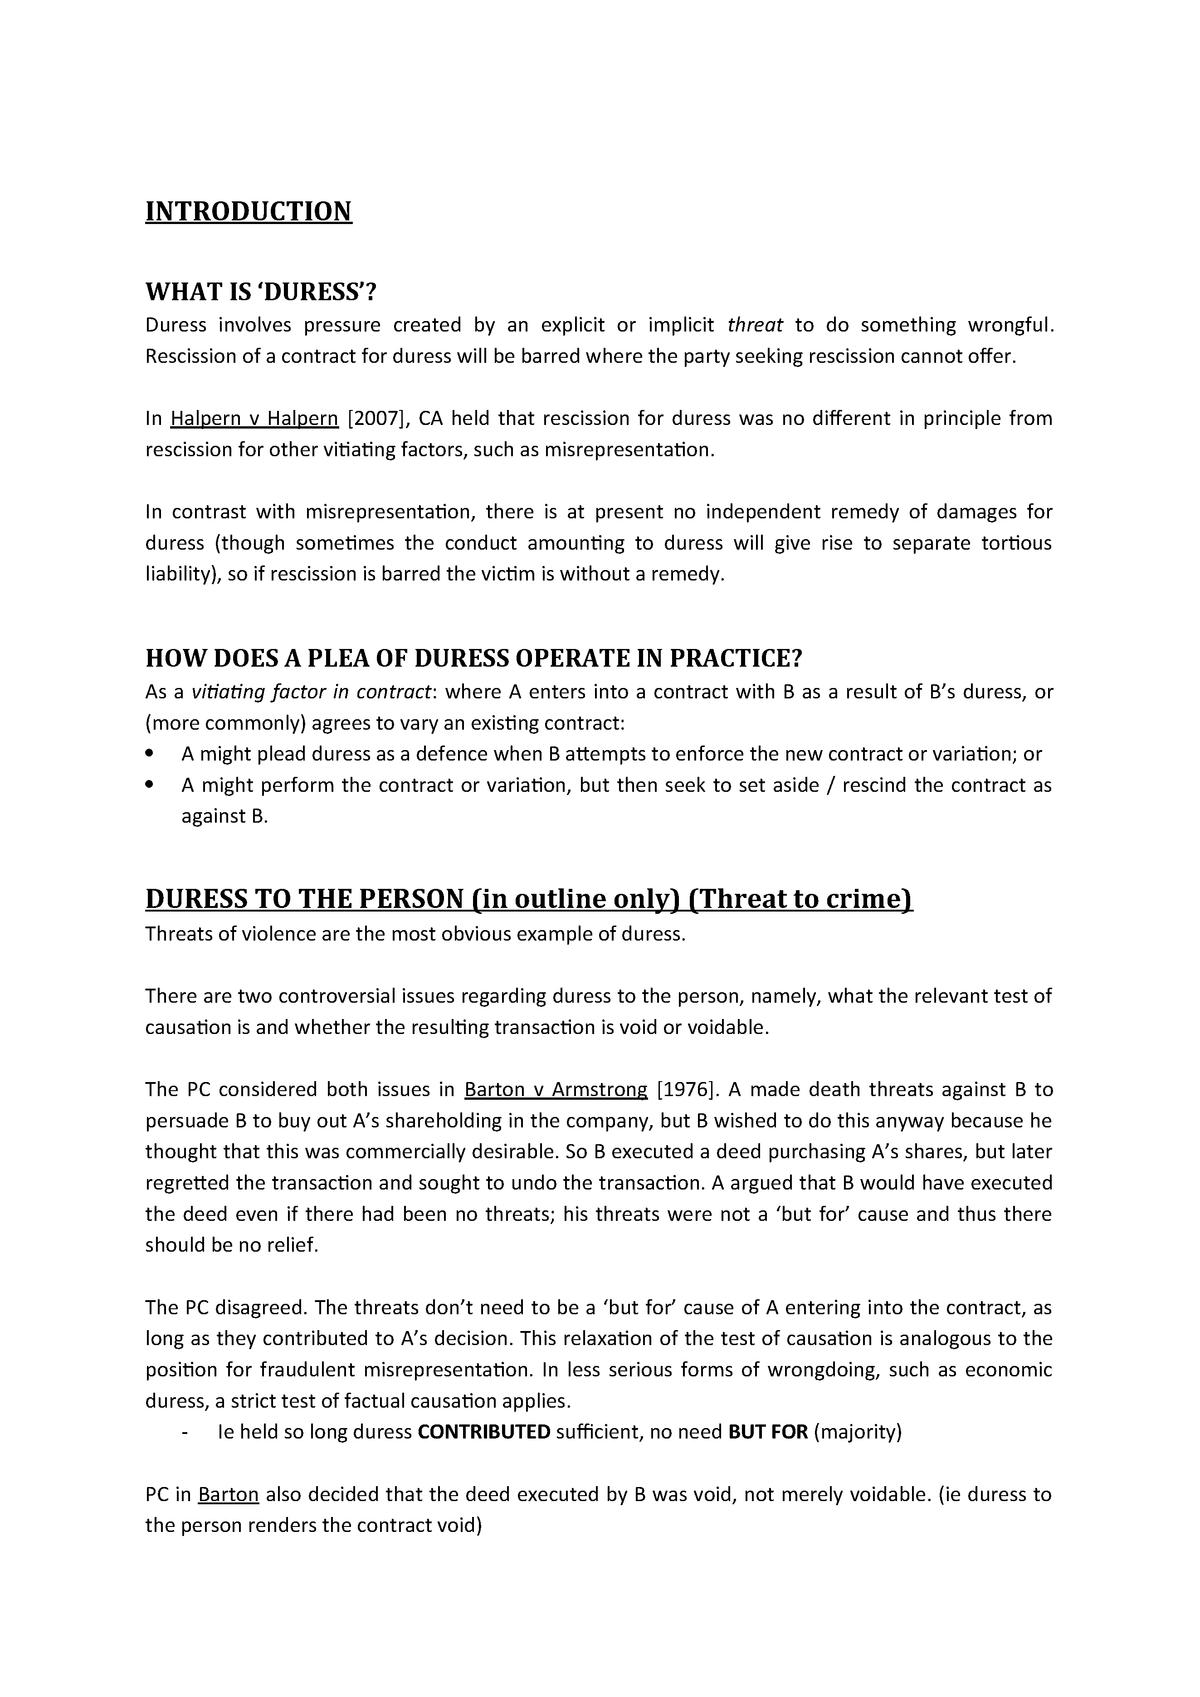 Summary 06 May 2018 - StuDocu